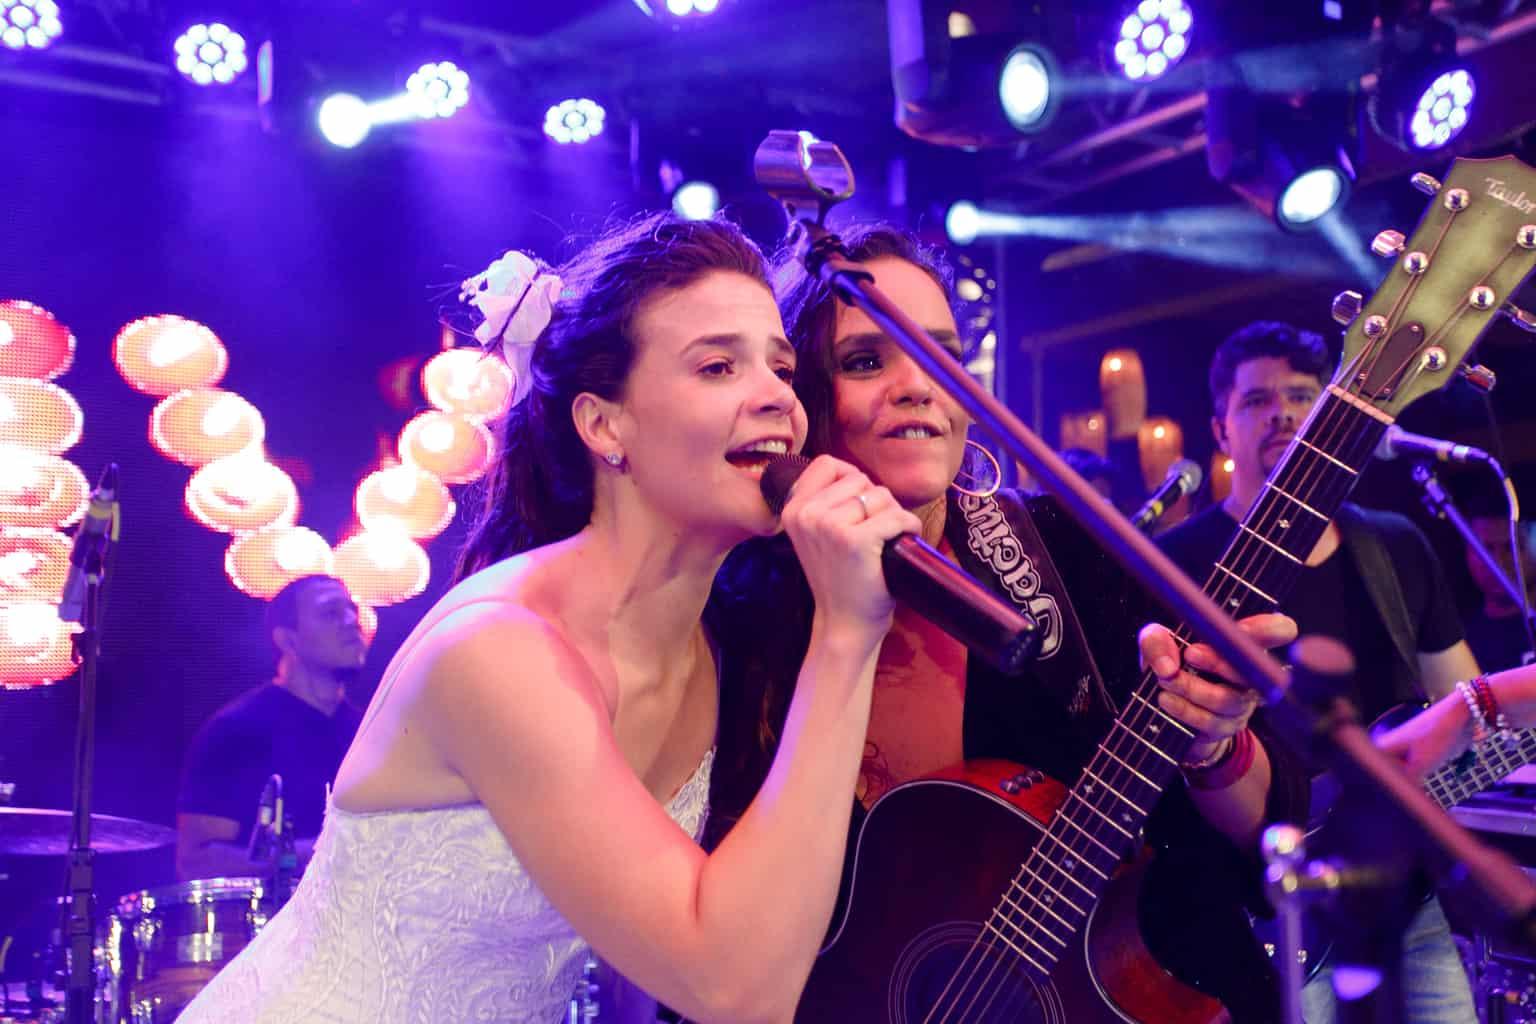 Casamento-Emanuelle-e-Alysson-Fotografia-Tadeu-Nanó-e-Luca-Antunes180